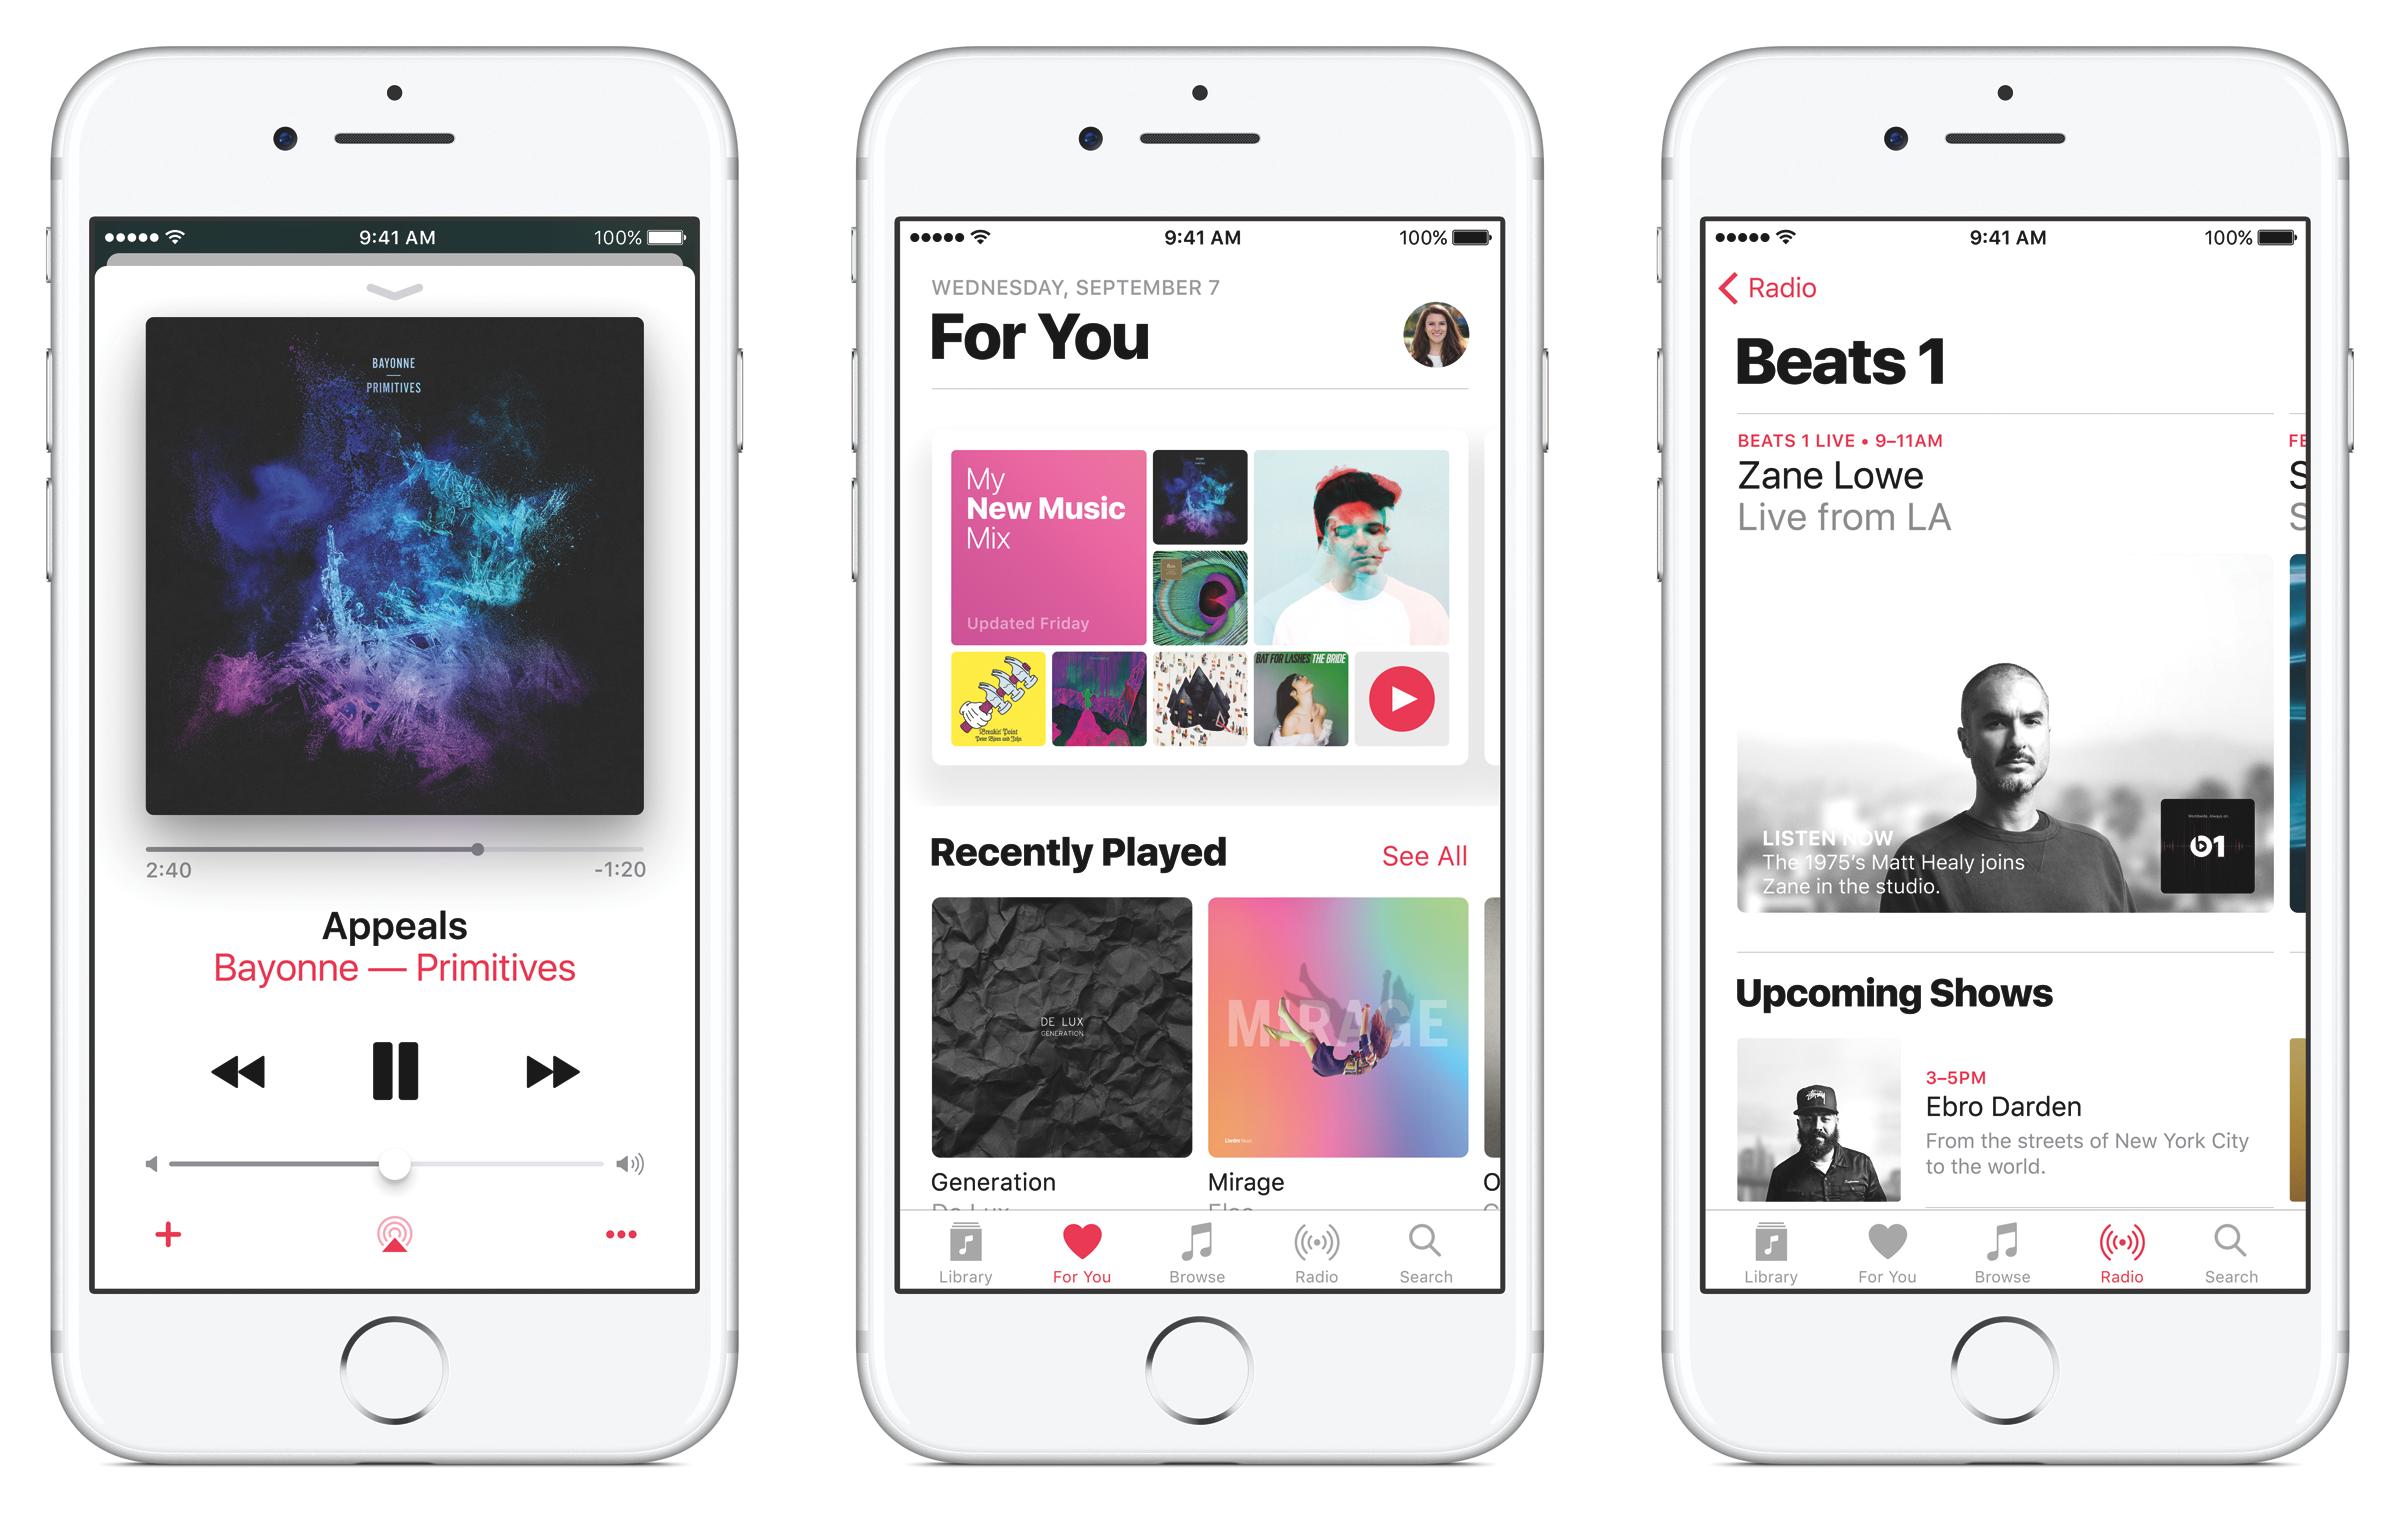 Apple Music interface shown on three iPhones